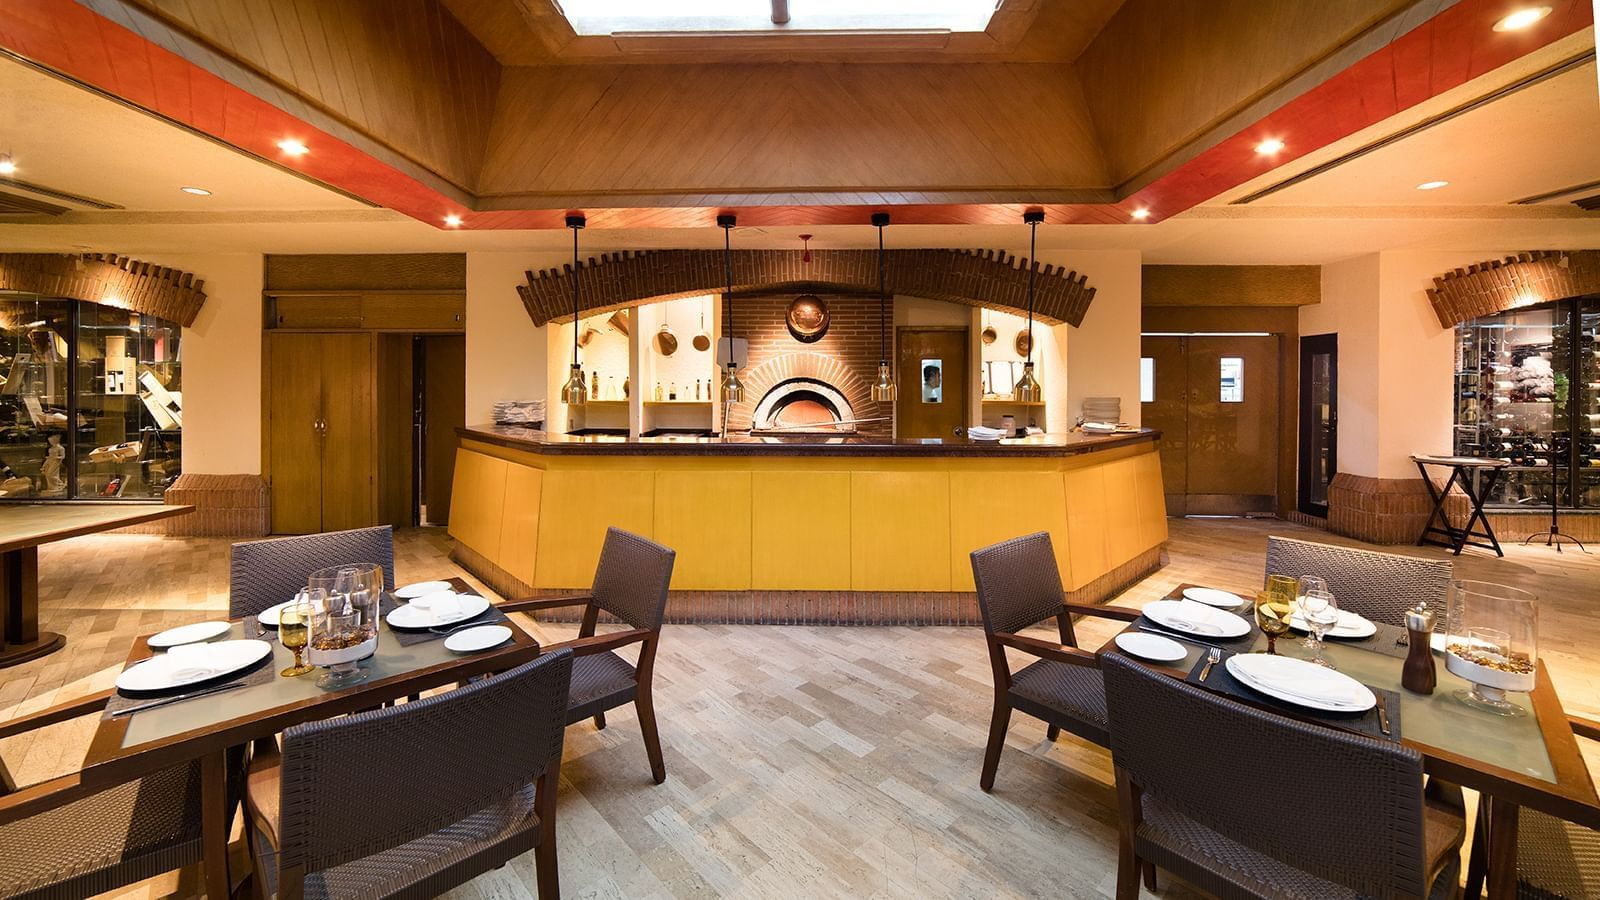 Dining area at Tavola Restaurant in Princess Mundo Imperial